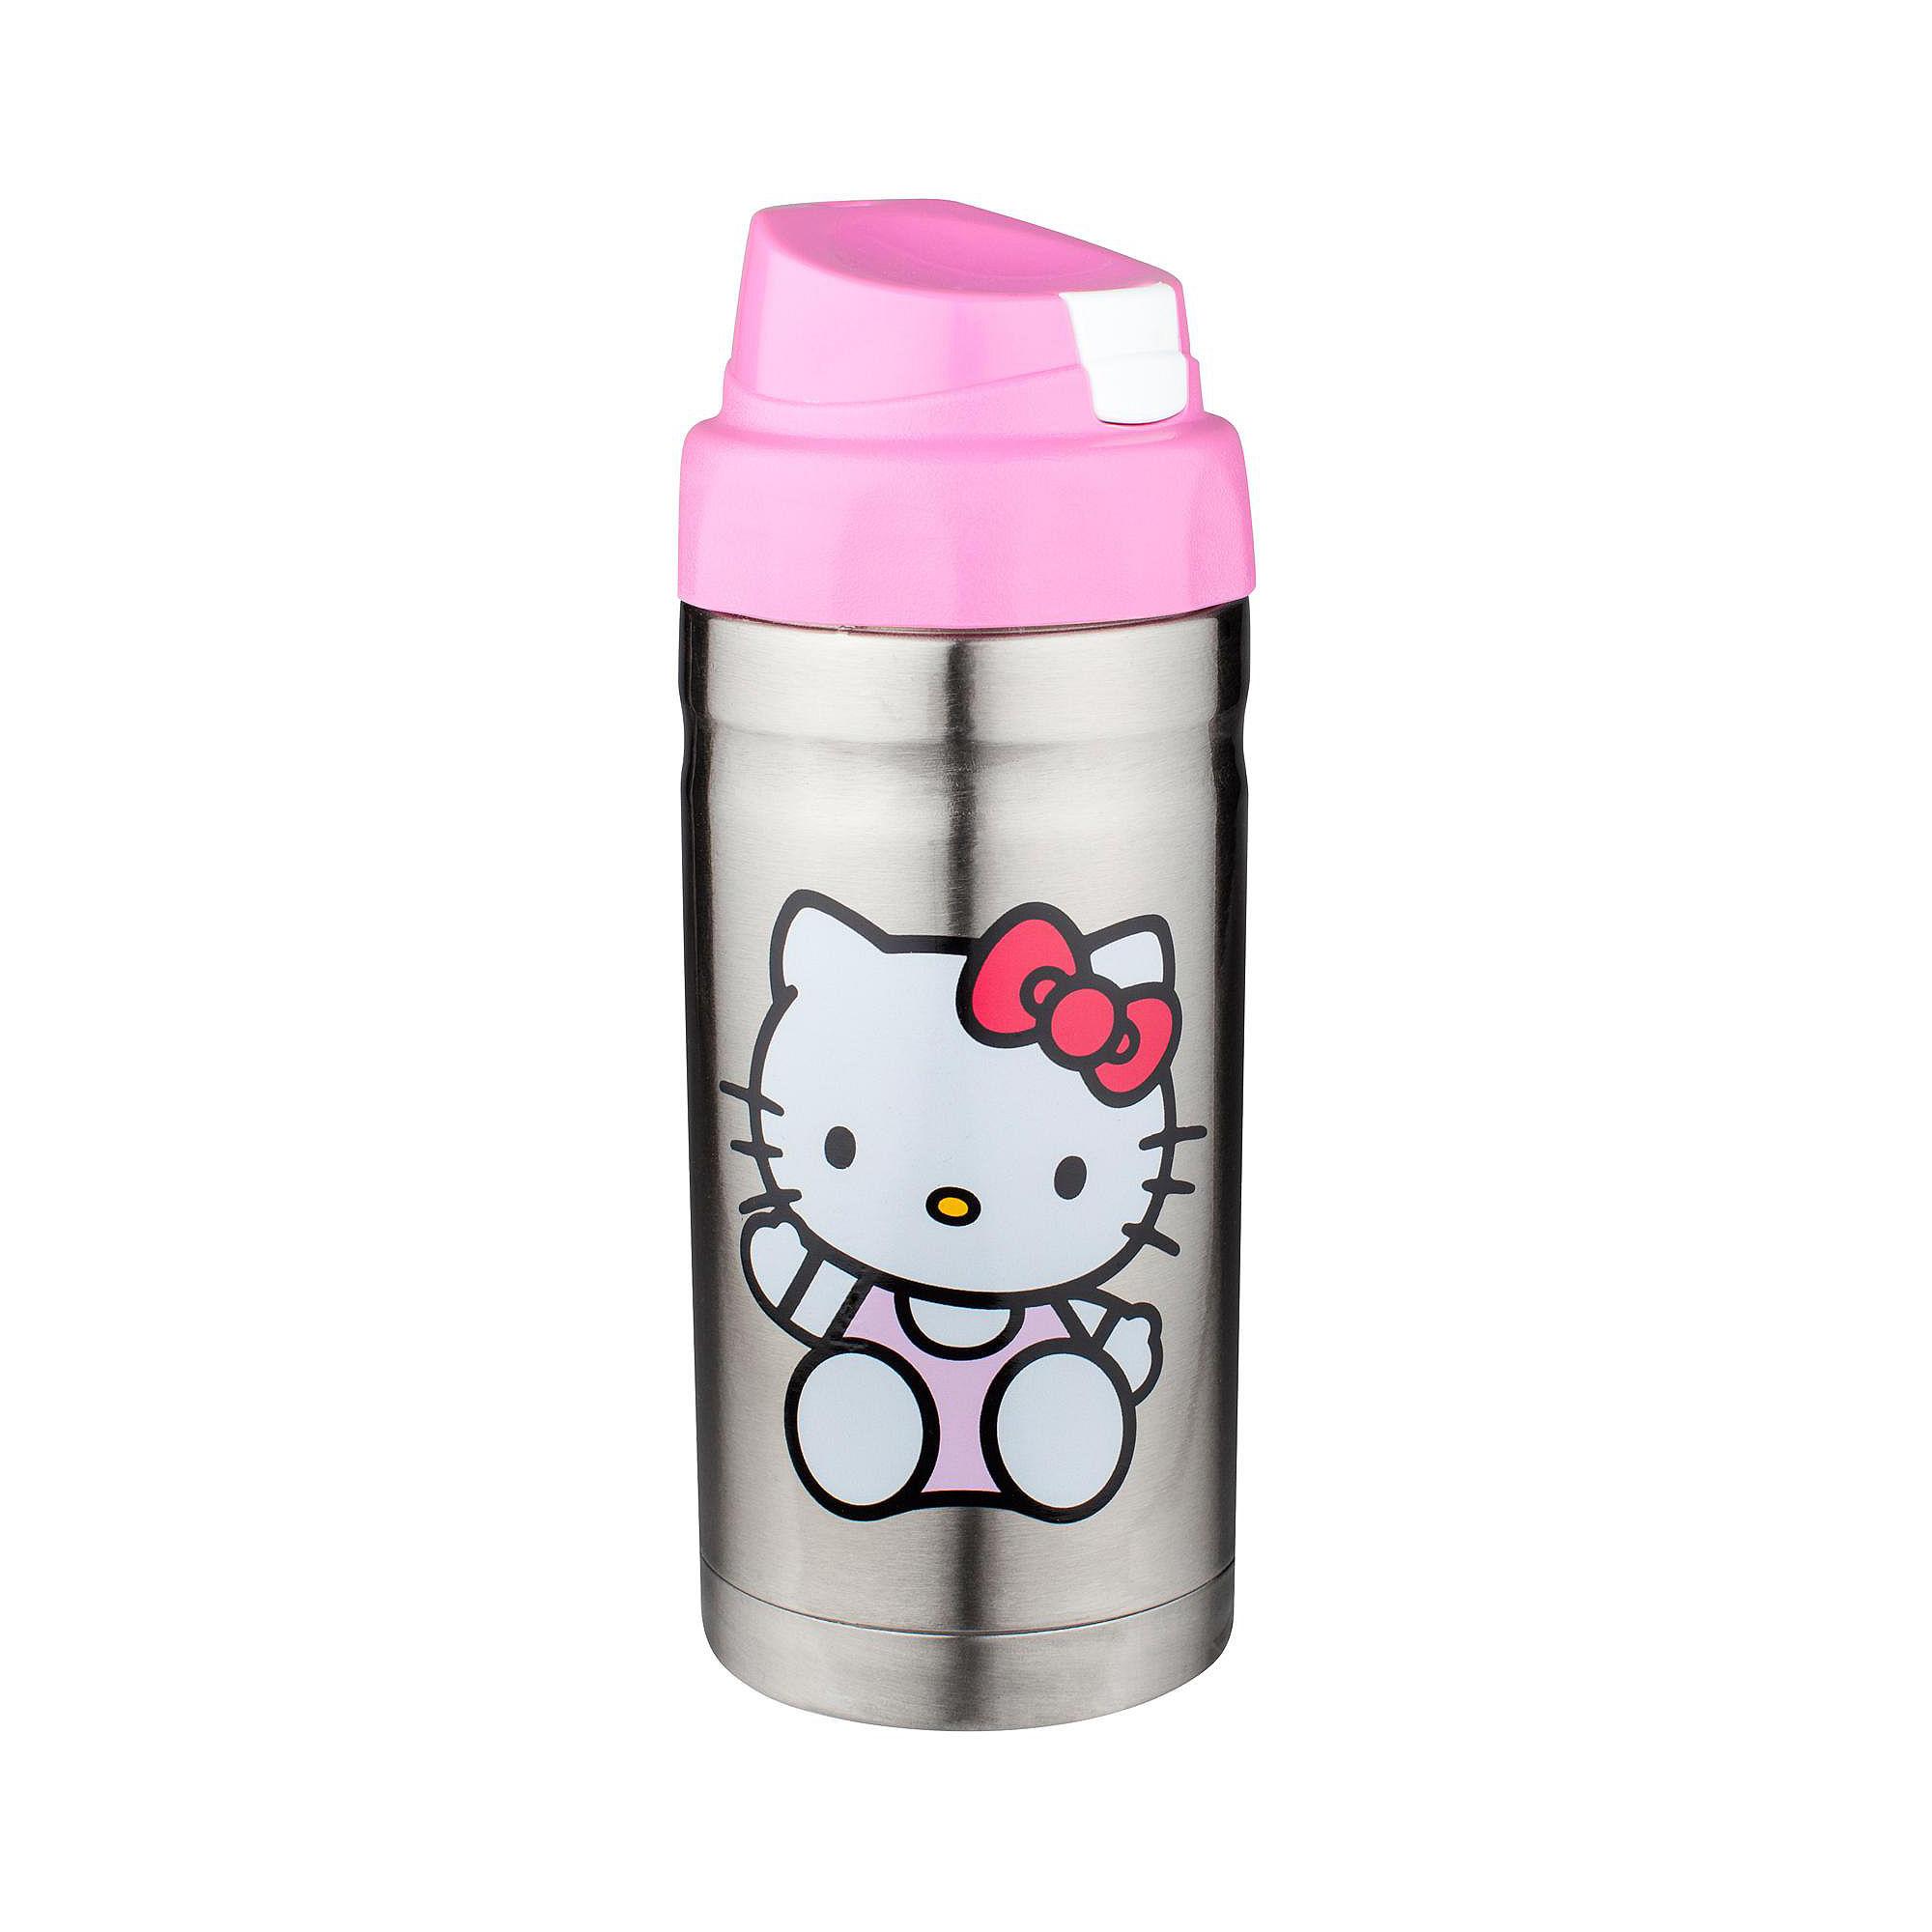 Zak Designs Hello Kitty 12-oz. Stainless Steel Canteen